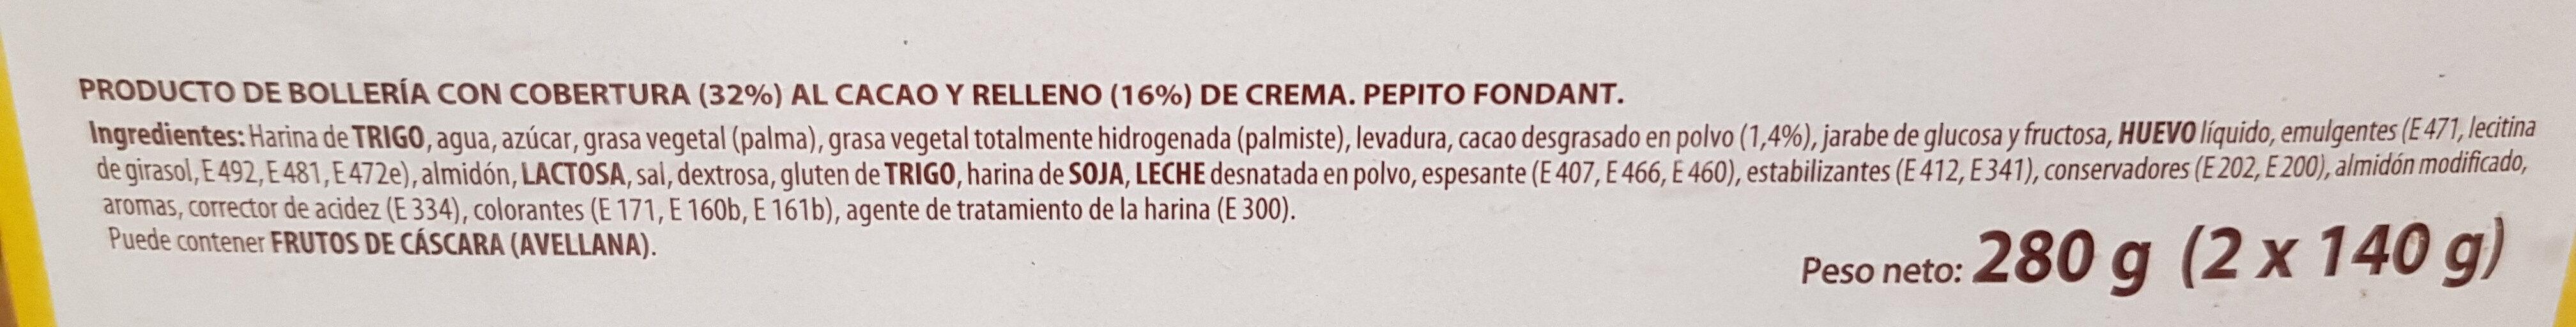 Pepito de chocolate - Ingredients